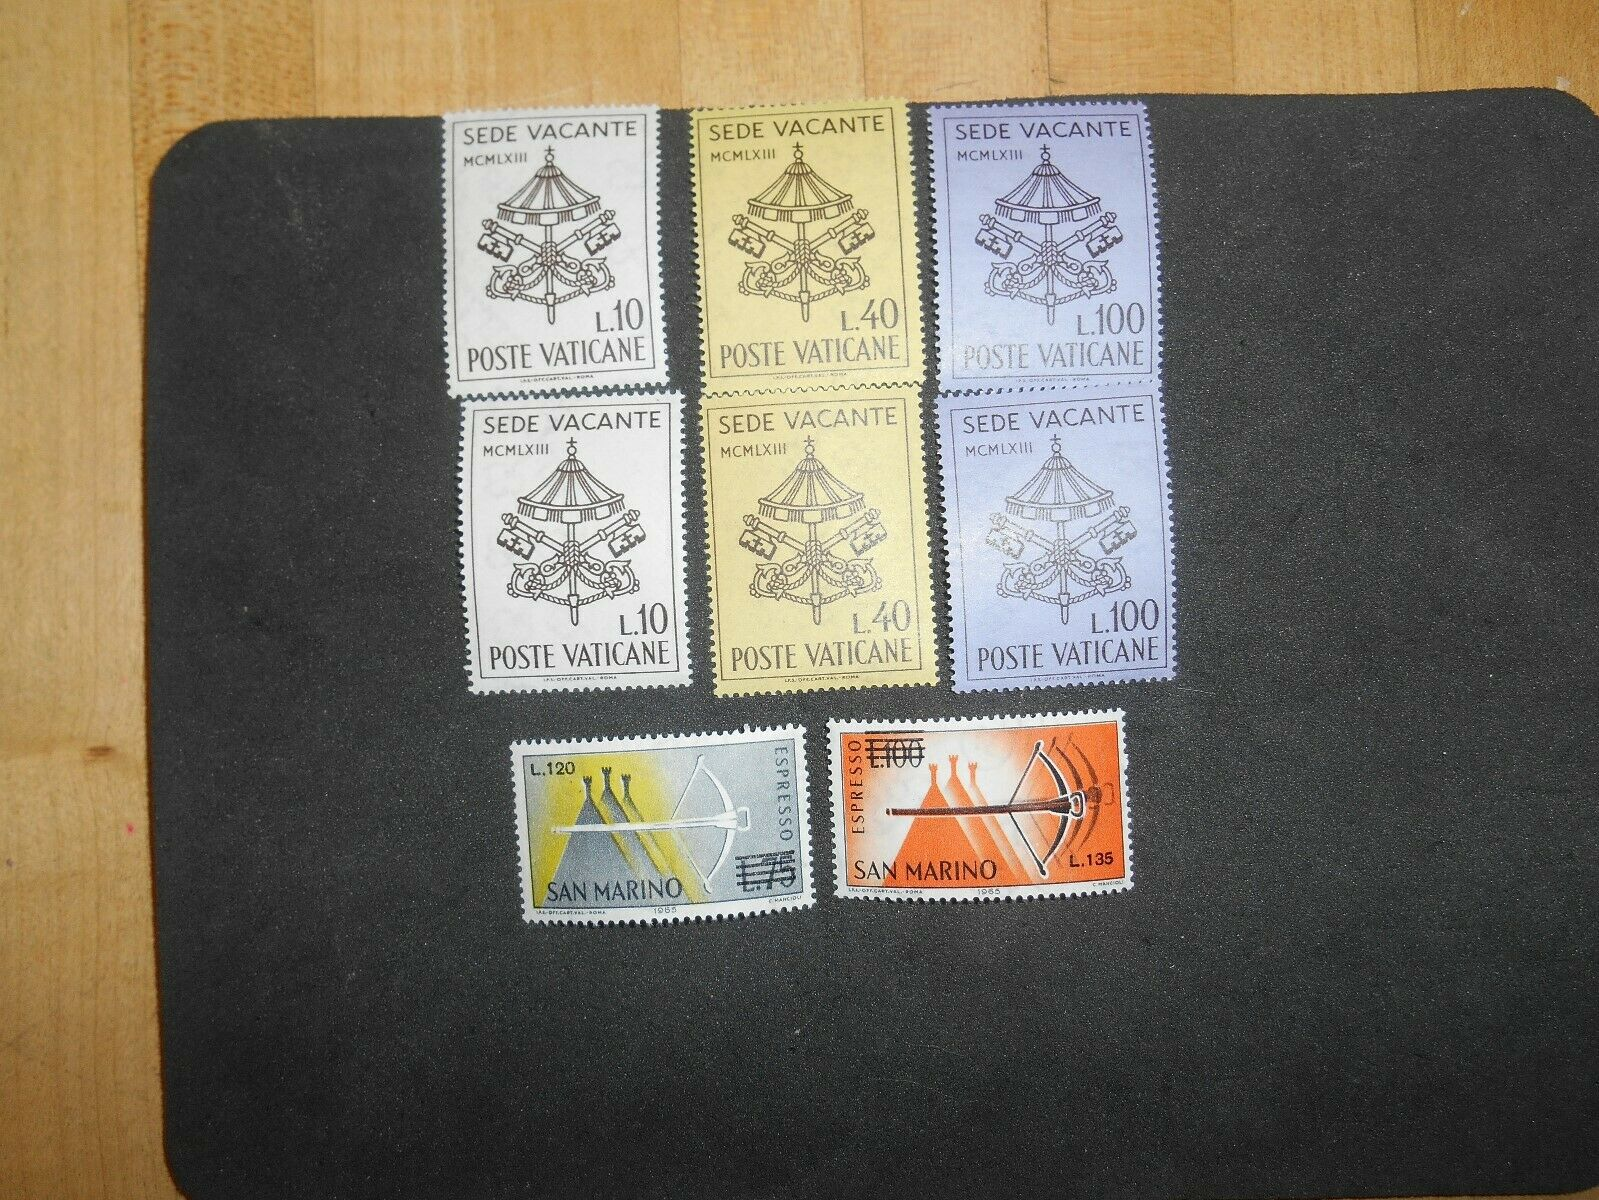 Vatican City 362-364 MNH Interregnum 1963 Sede Vacante.San Marino E27-27 MNH - $2.75